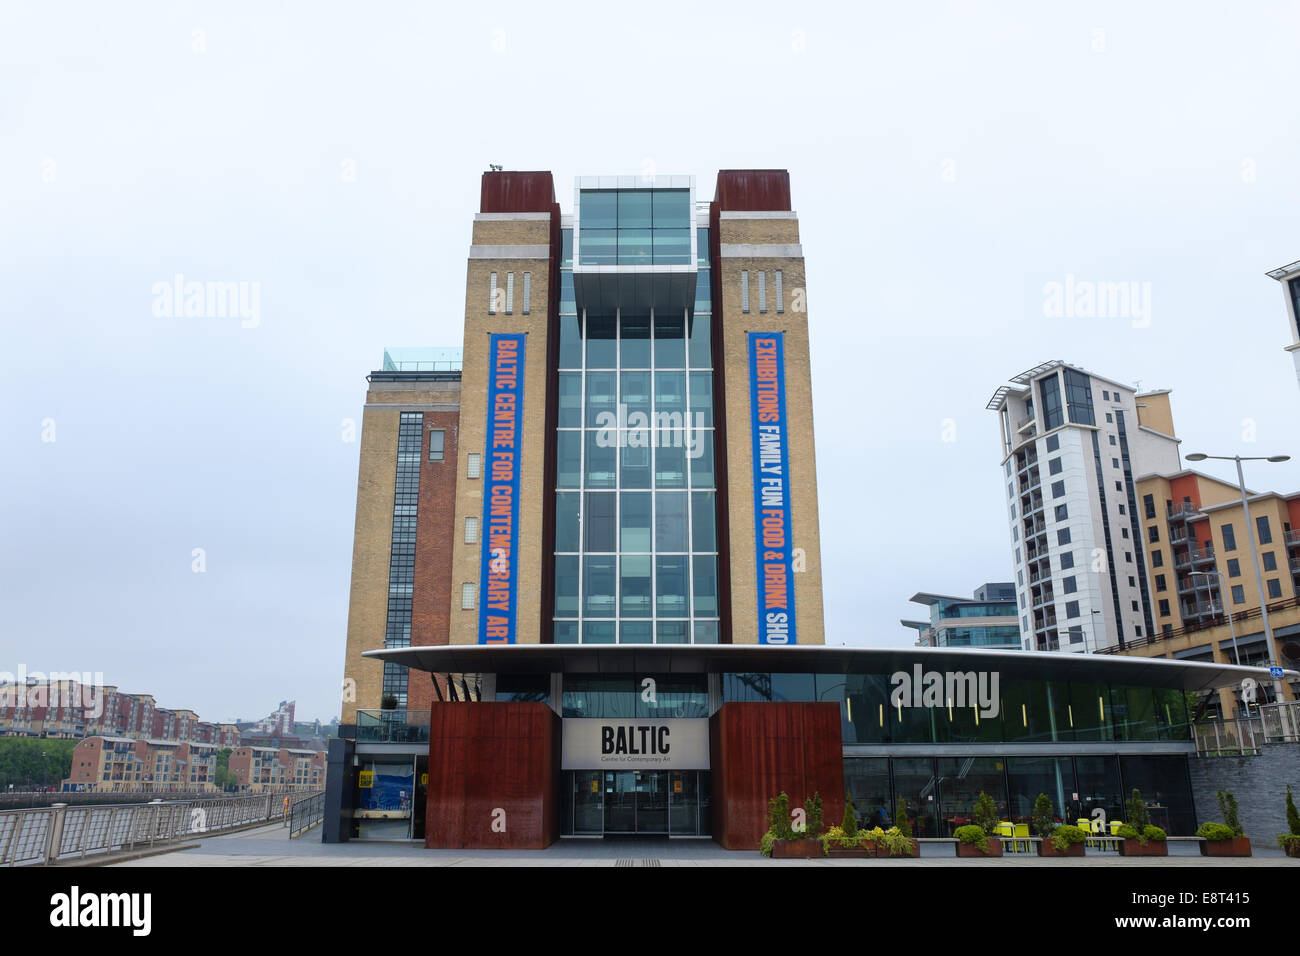 A renovated building - The entrance exterior of the BALTIC Centre Center for Contemporary Art, Gateshead Quays Arts - Stock Image